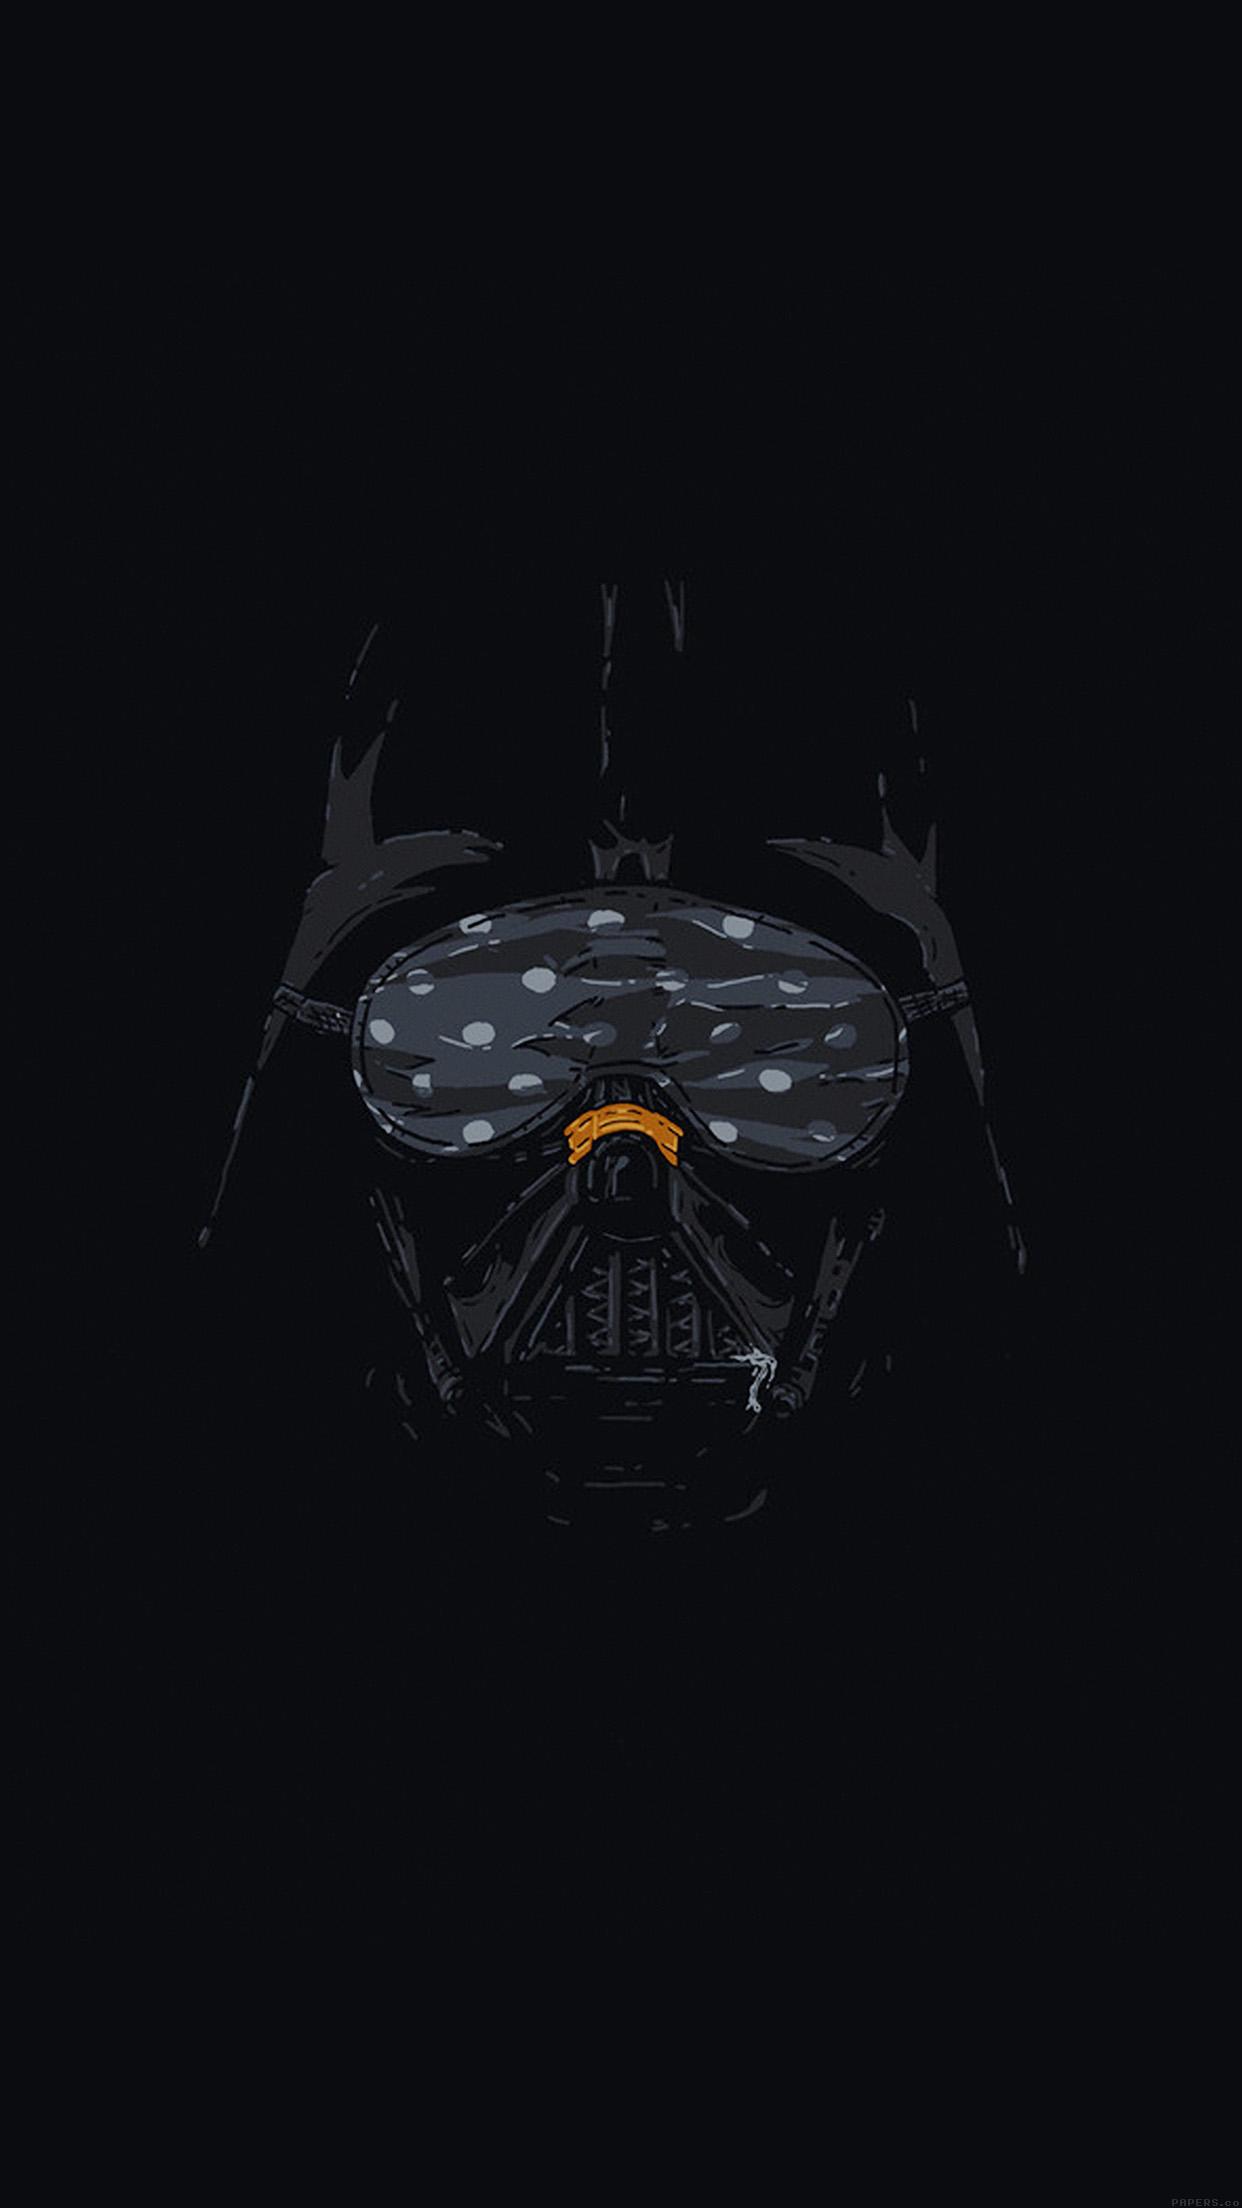 Iphonepapers Ah87 Darth Vader Minimal Starwars Illust Art